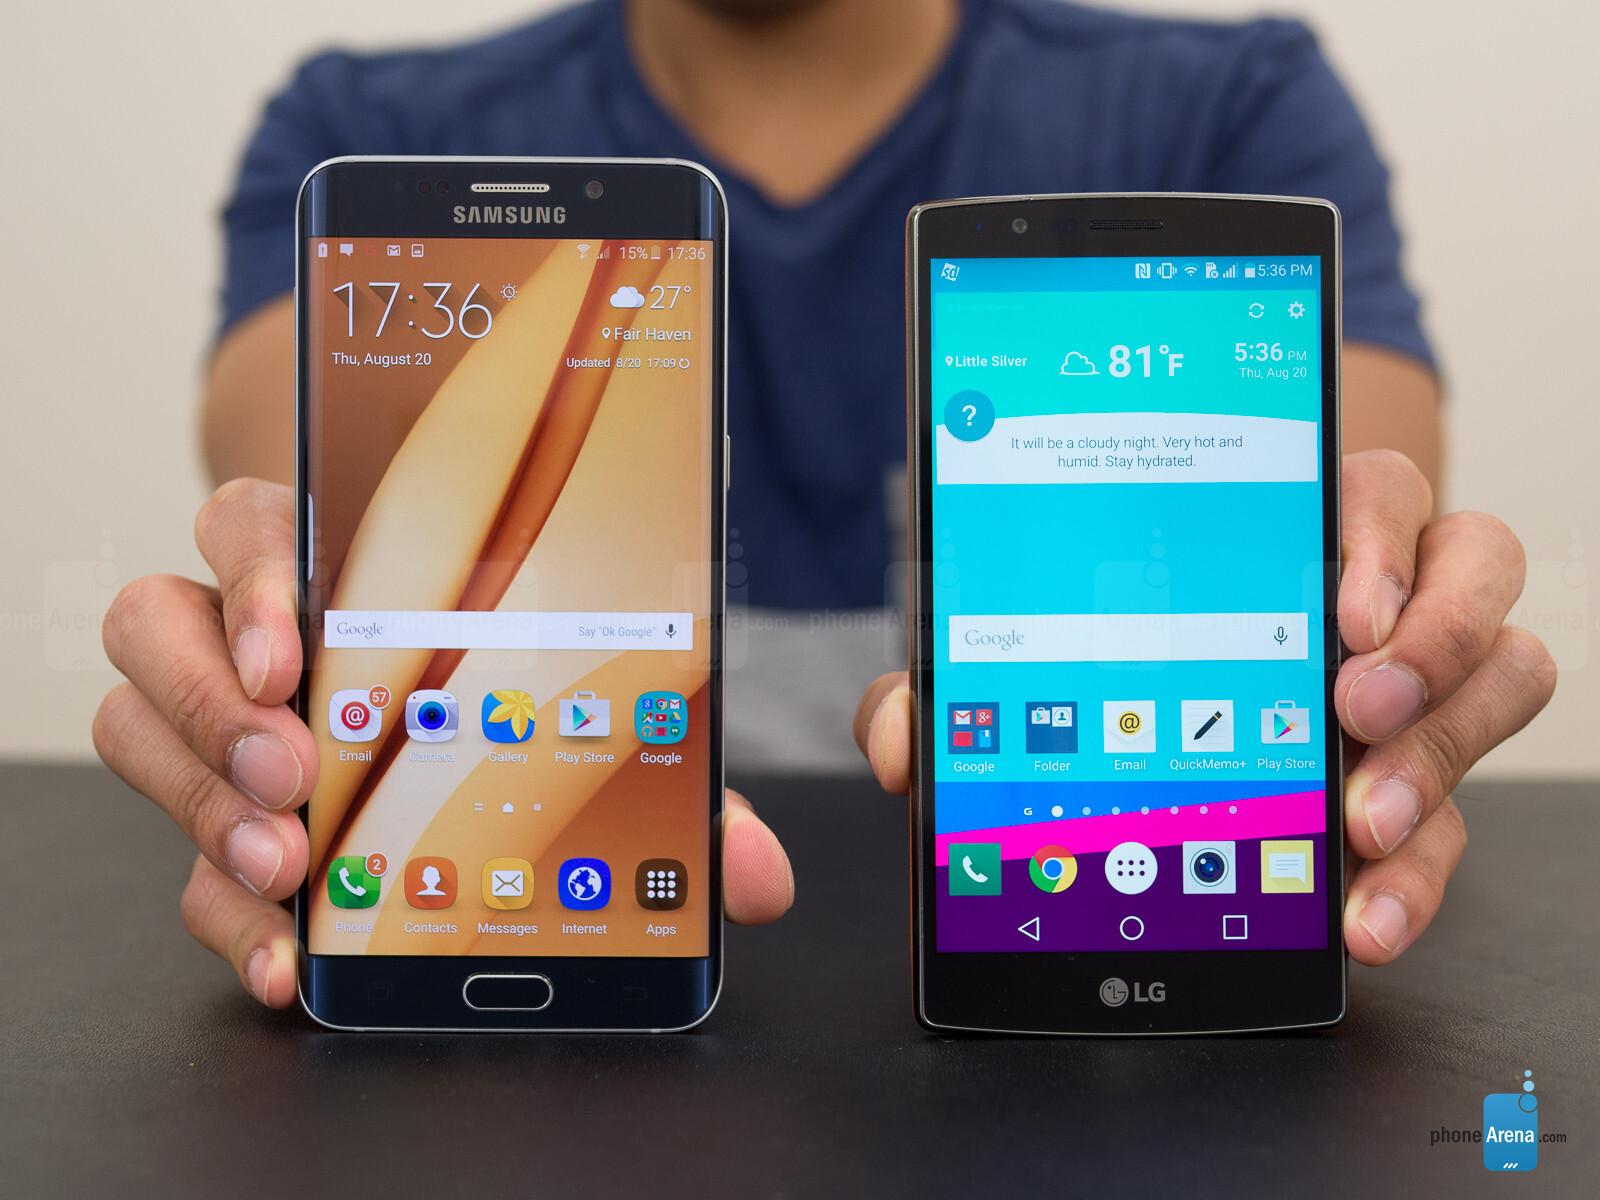 Lg G4 Vs Galaxy S7 Edge: Samsung Galaxy S6 Edge+ Vs LG G4